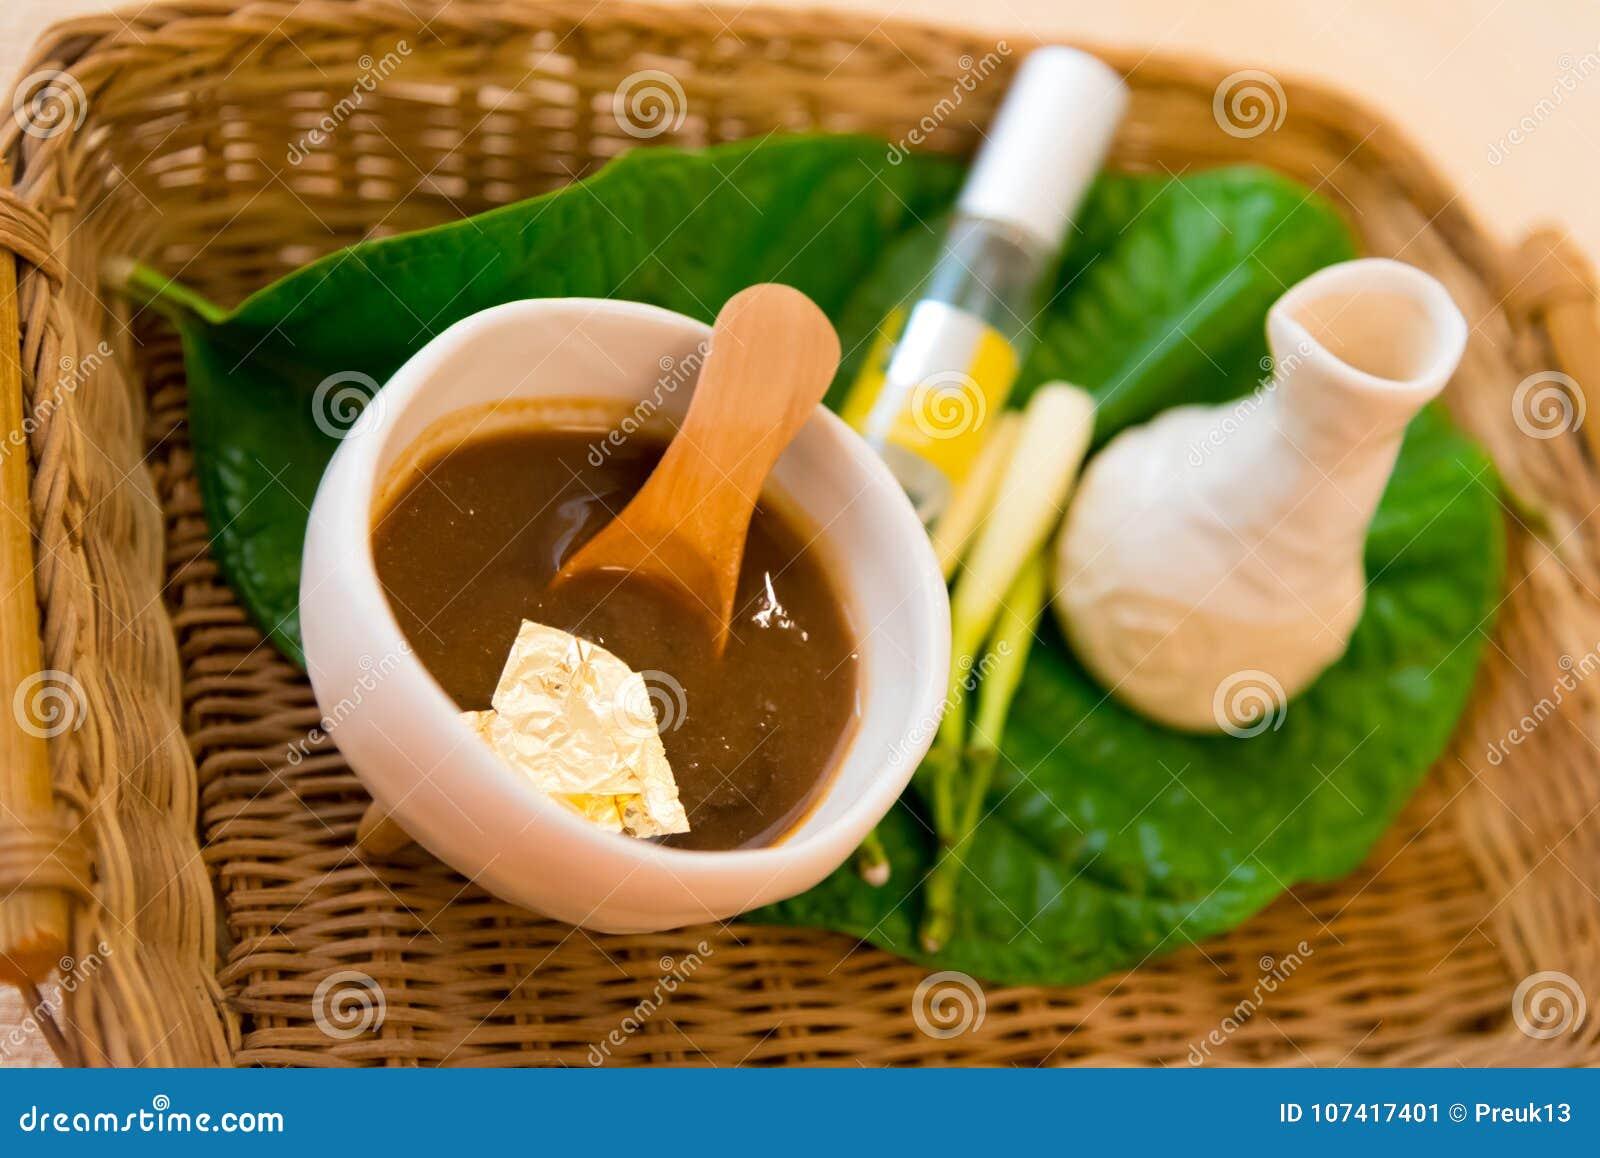 Massage equipment stock image. Image of wooden, beauty - 107417401